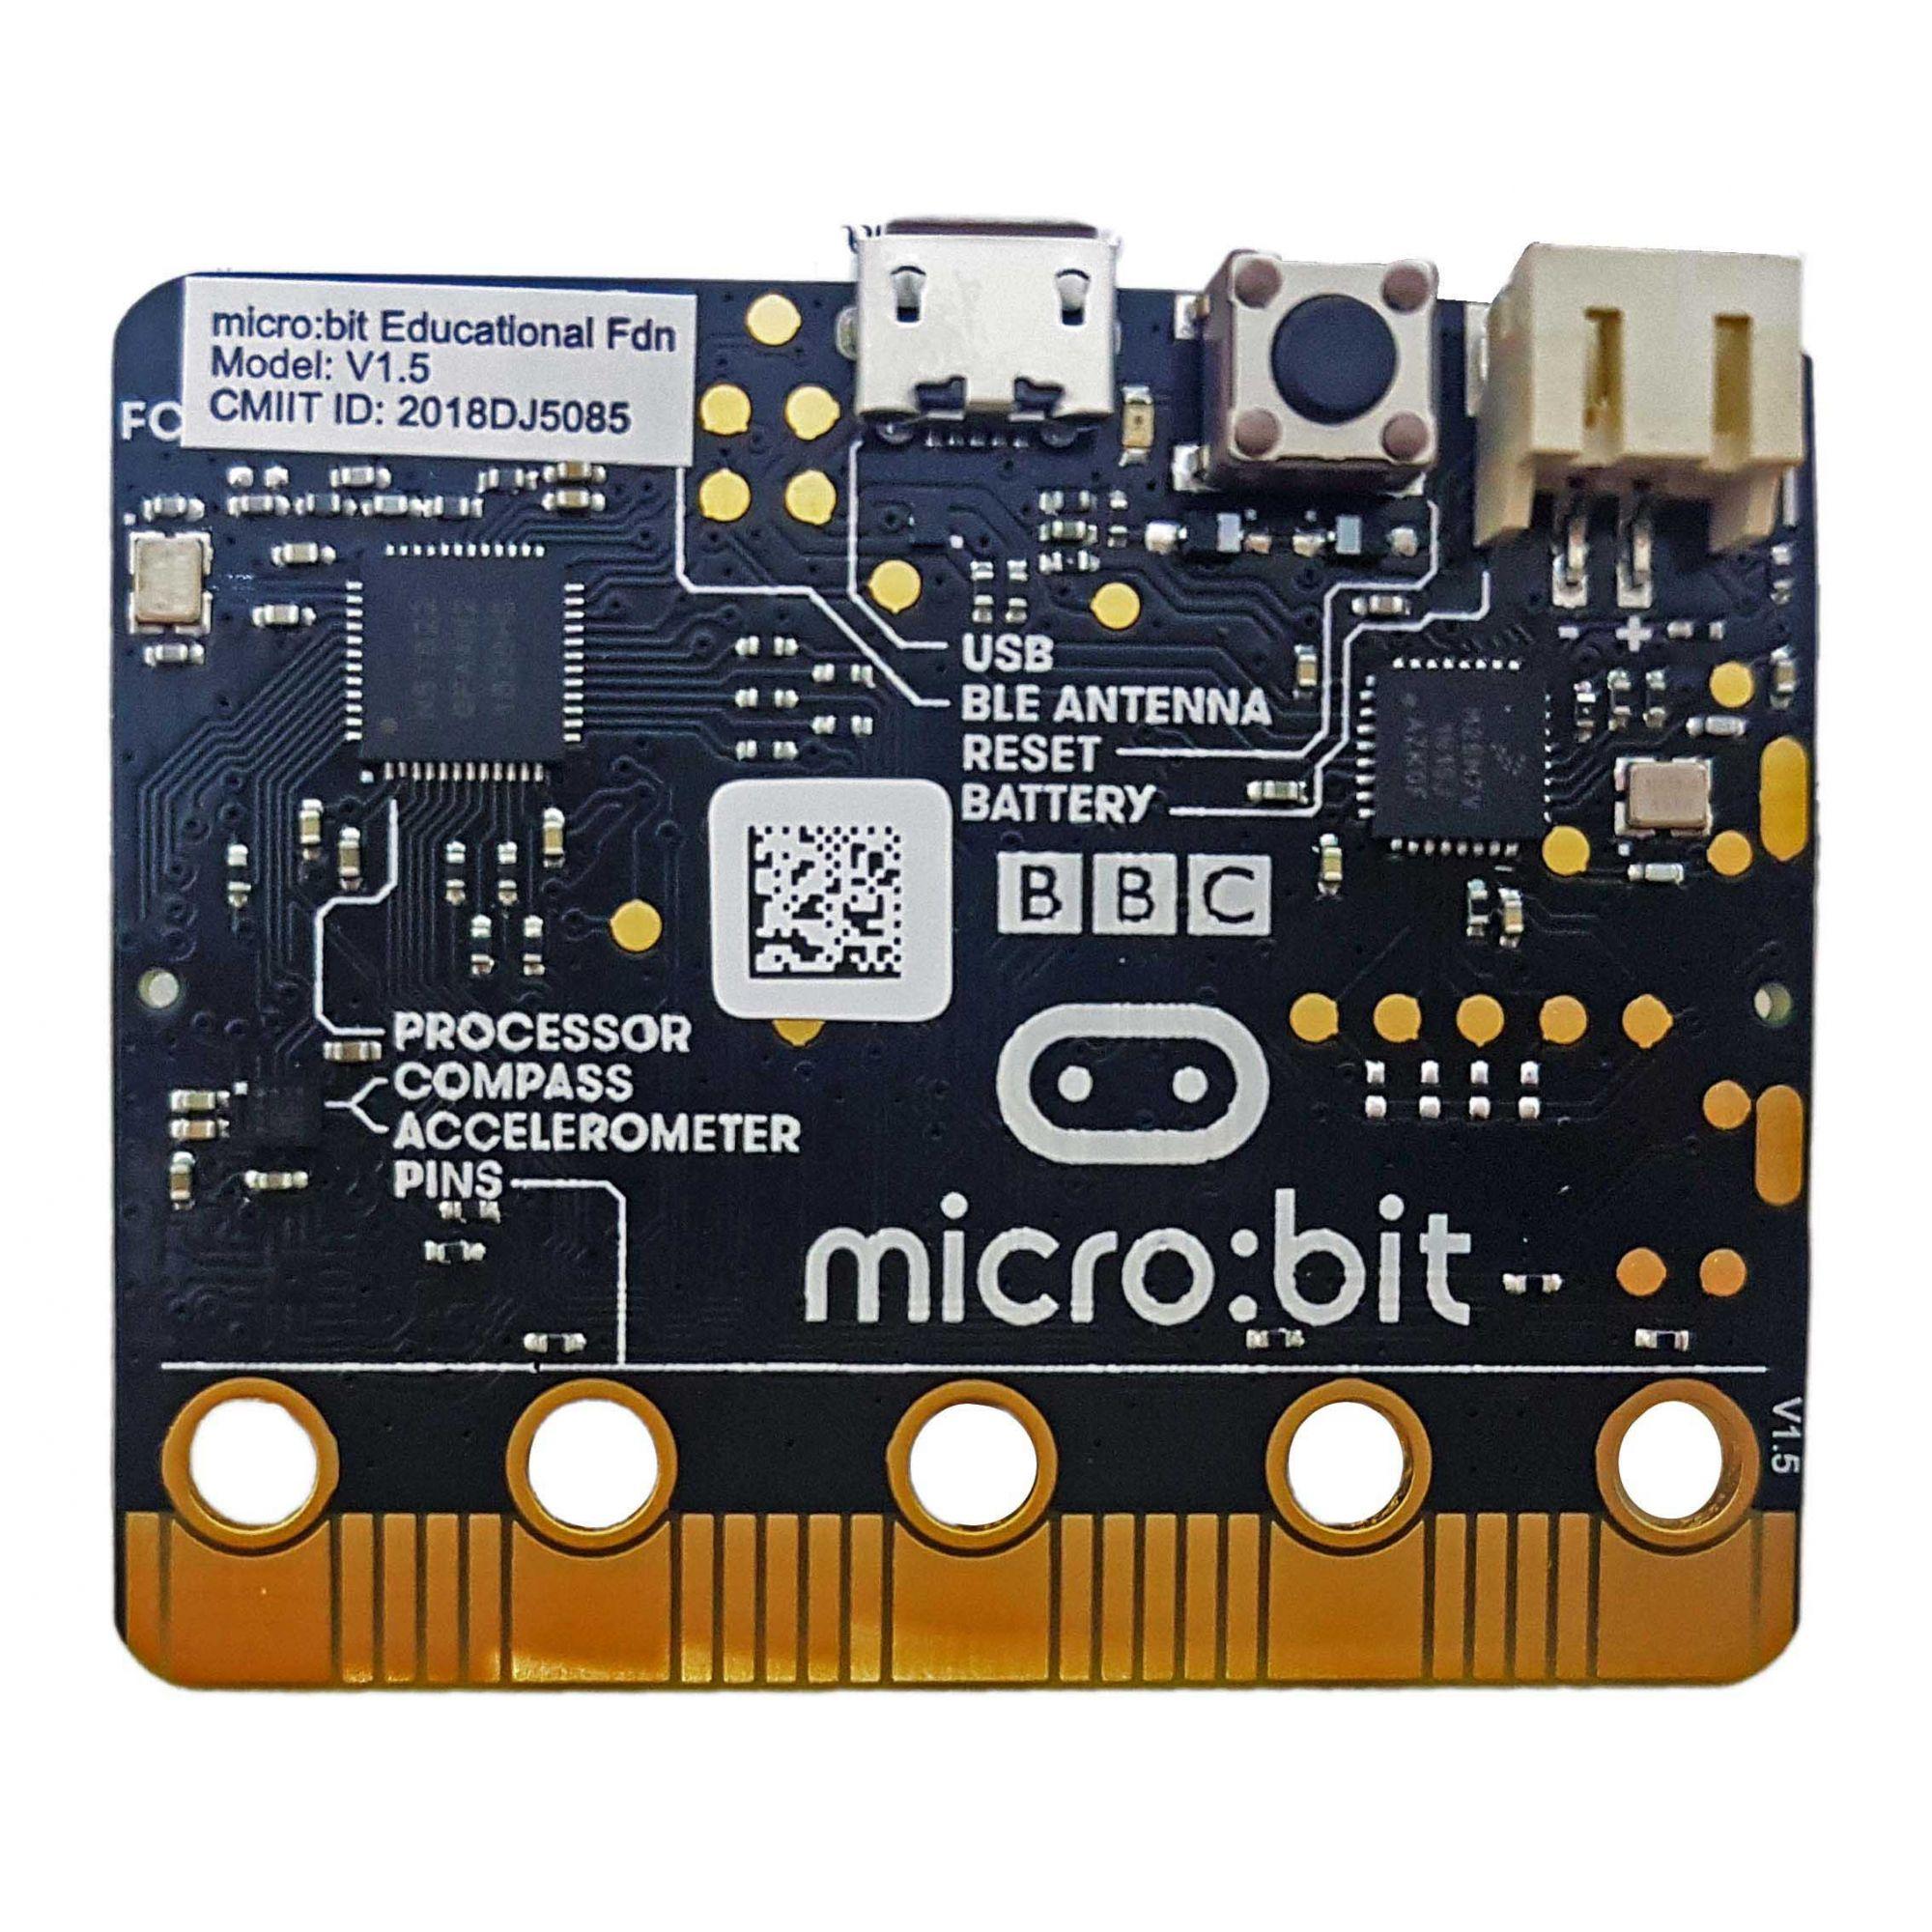 Placa Micro:bit